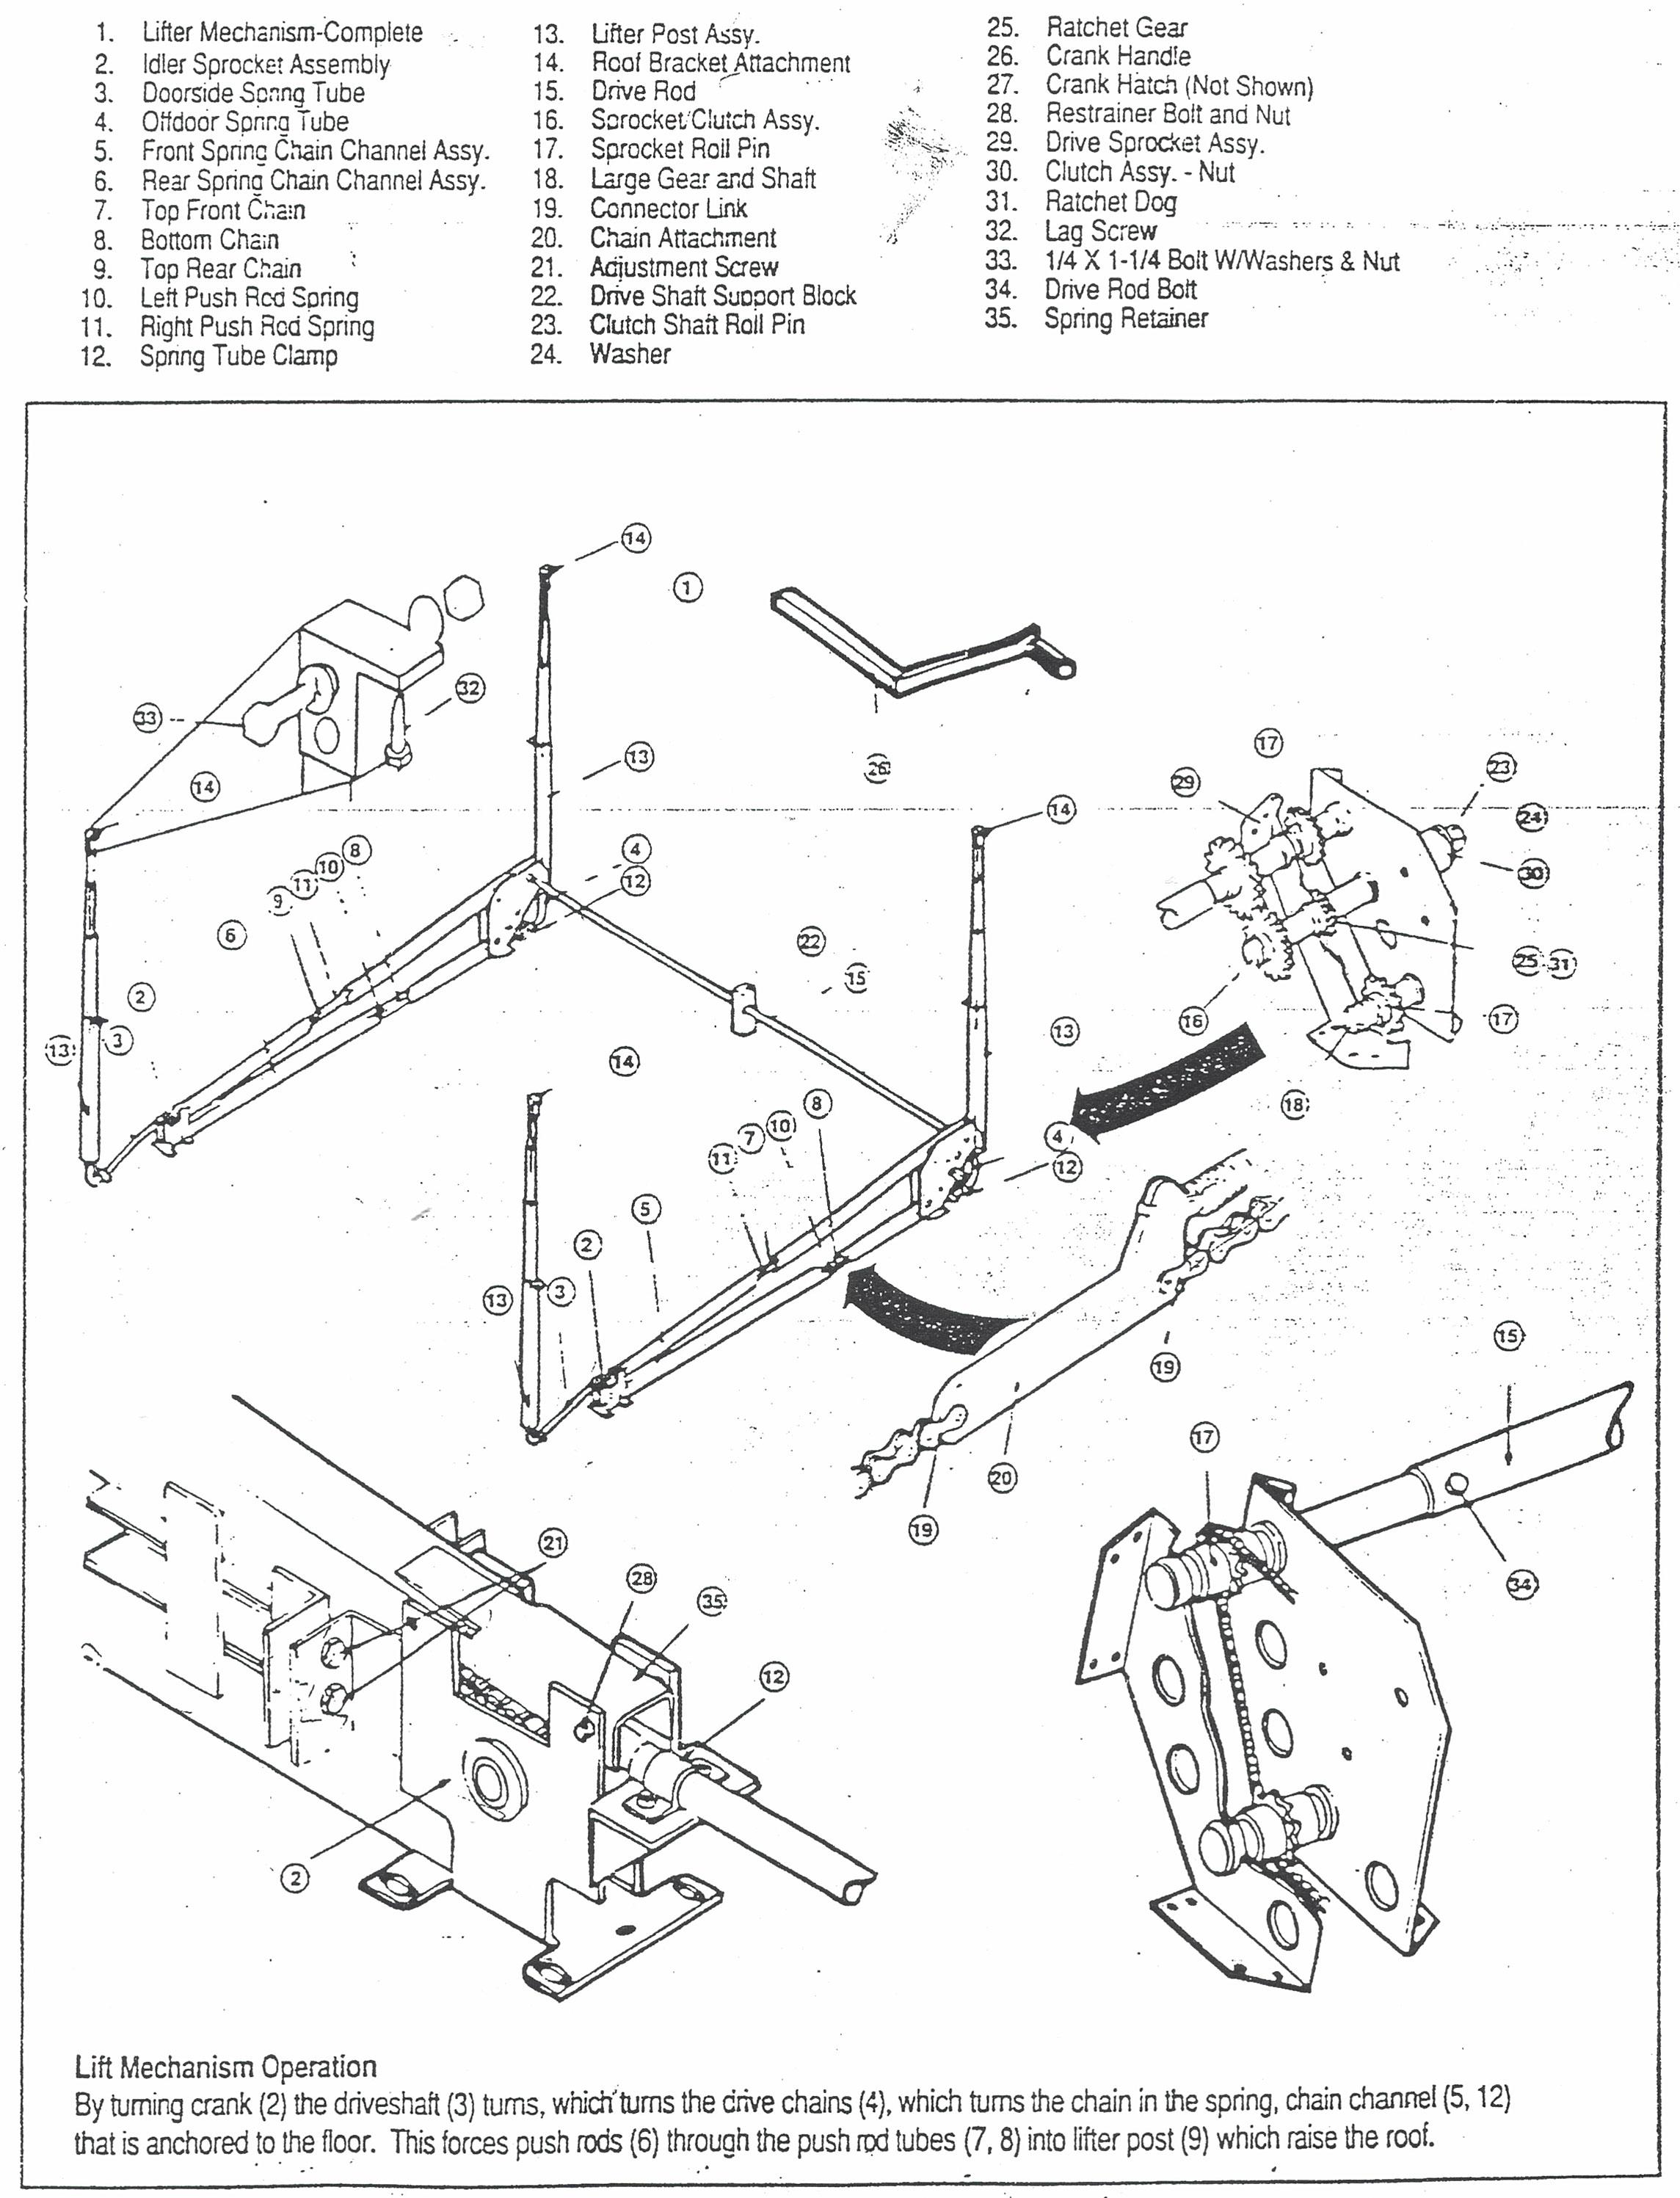 [DIAGRAM_1JK]  BM_6529] 2005 Viking Pop Up Camper Wiring Diagram Schematic Wiring | Viking 24 Volt Trailer Wiring Schematic |  | Xlexi Abole Phan Gious Sequ Diog Ginou Pelap Elec Mohammedshrine Librar  Wiring 101